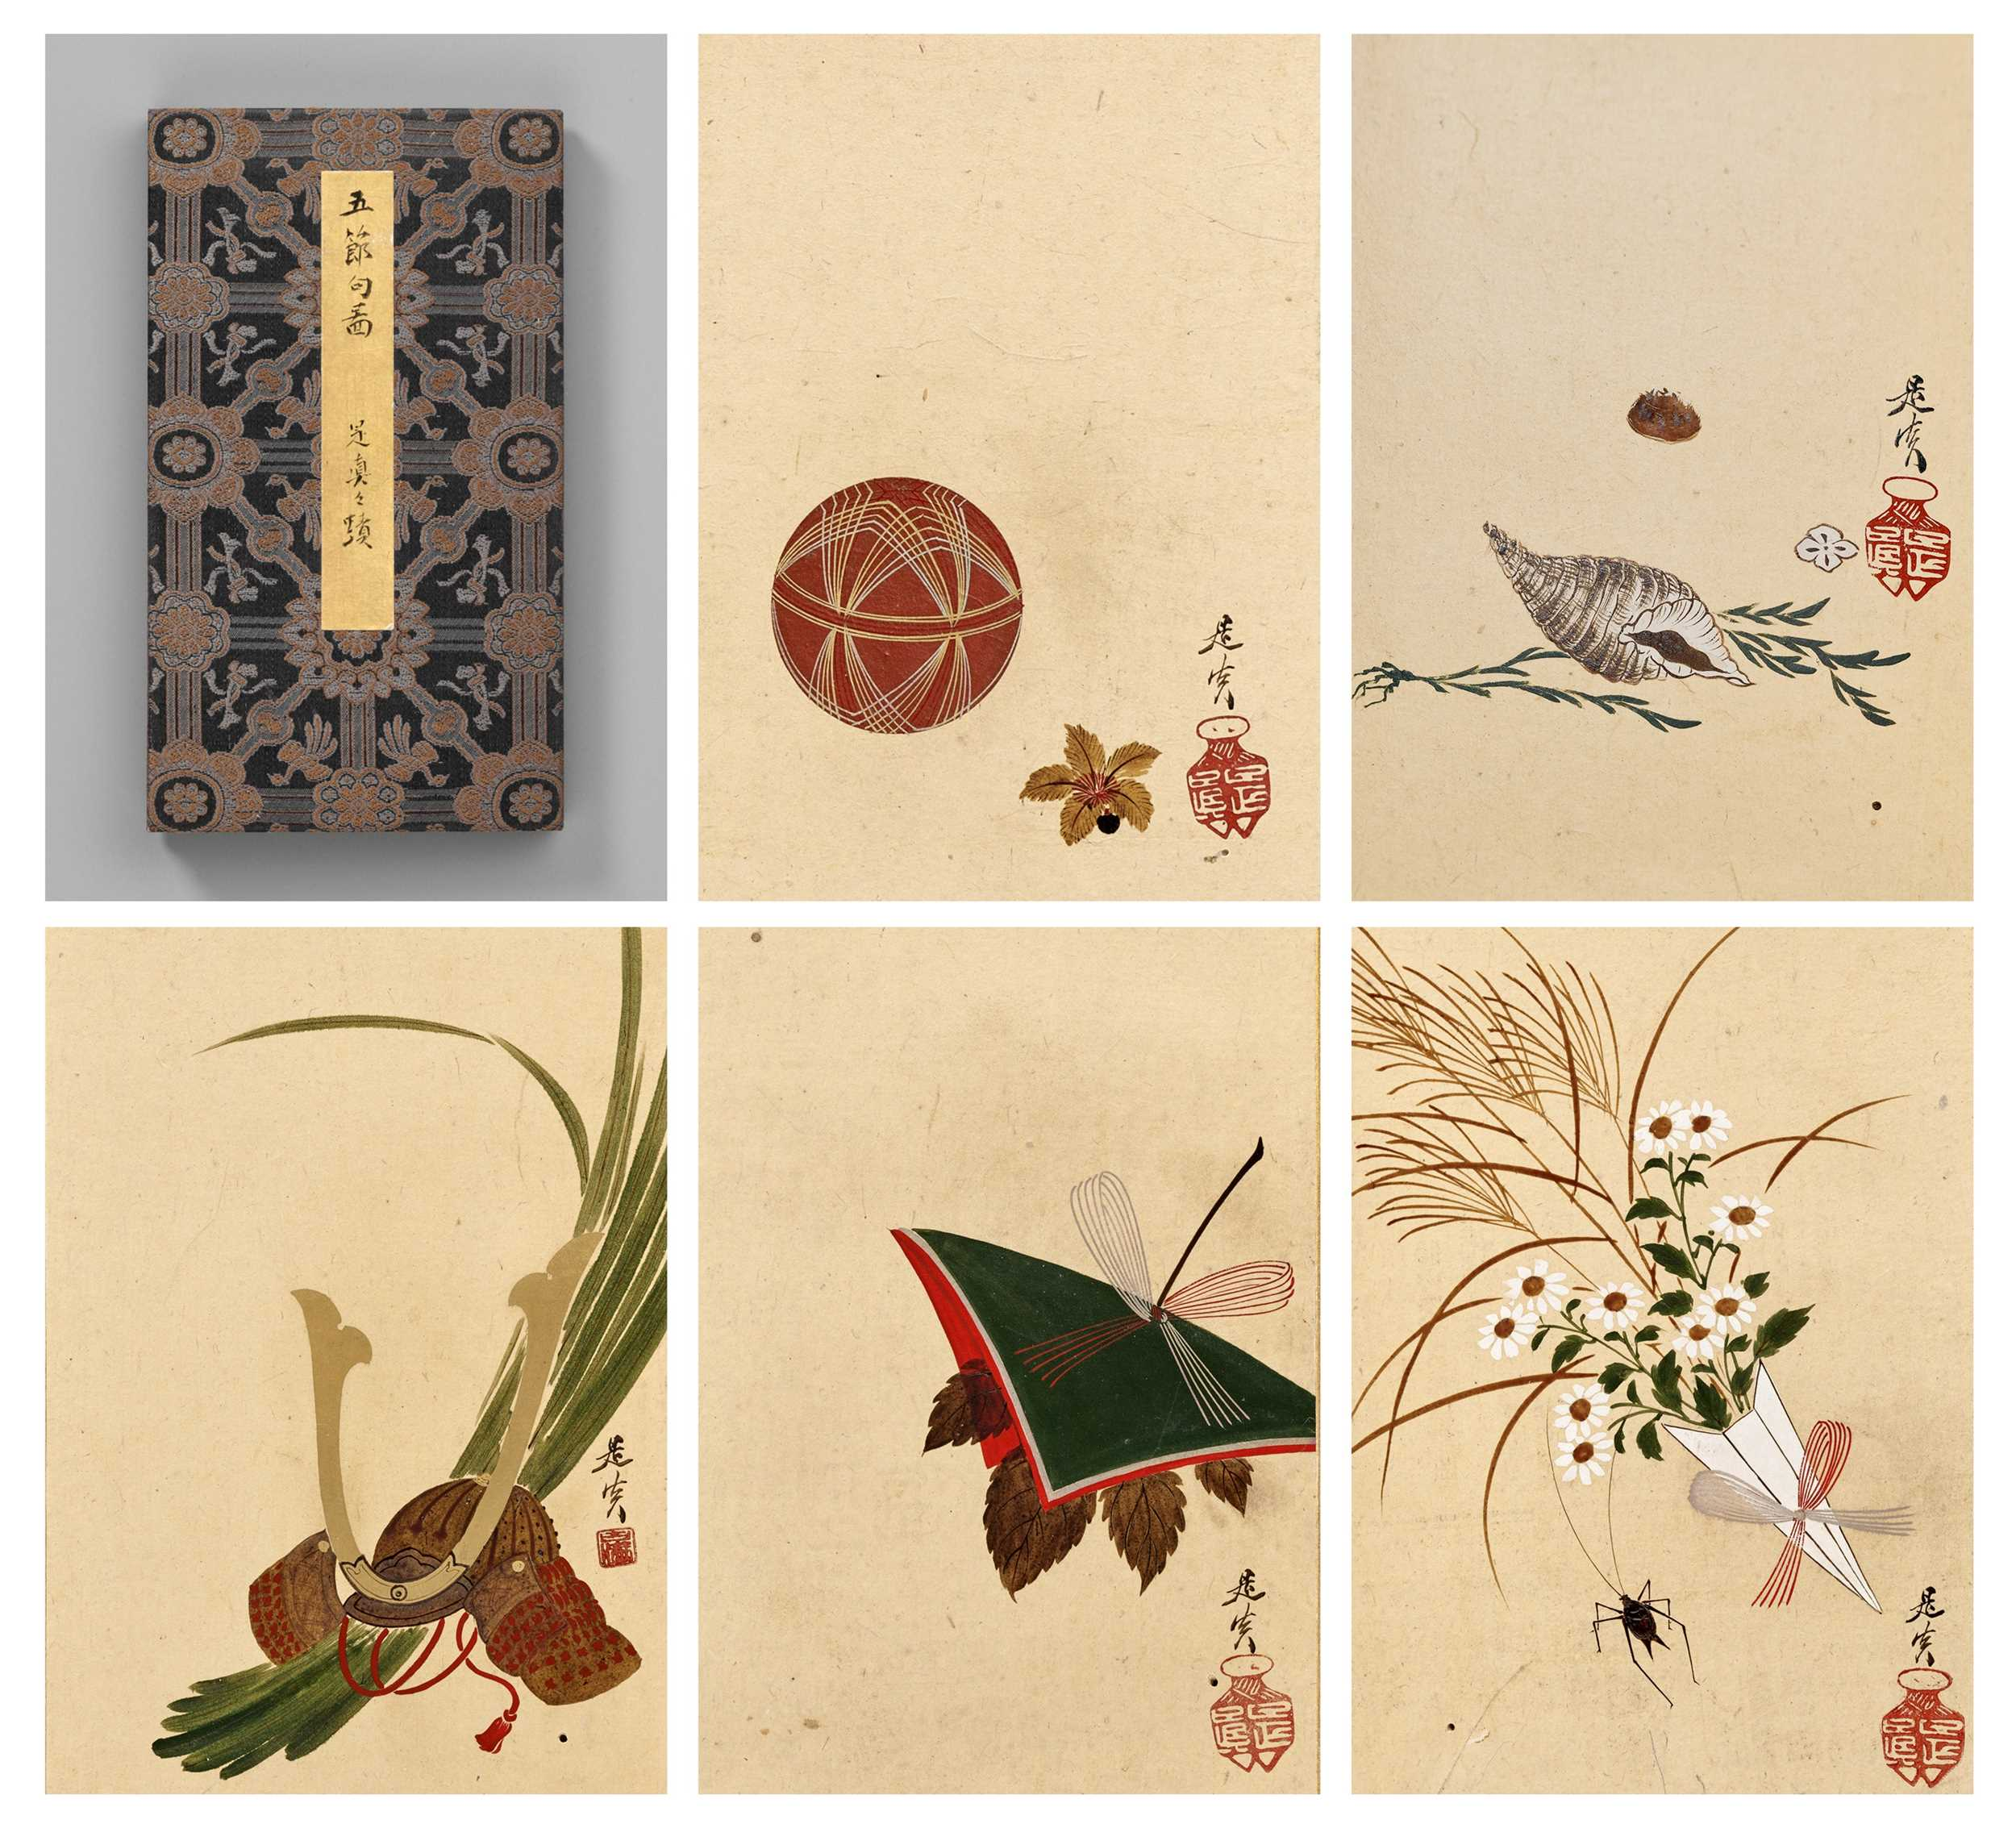 Lot 107 - SHIBATA ZESHIN: AN IMPORTANT ALBUM OF FIVE LACQUER PAINTINGS DEPICTING THE GOSEKKU (FIVE CHIEF FESTIVALS OF JAPAN)